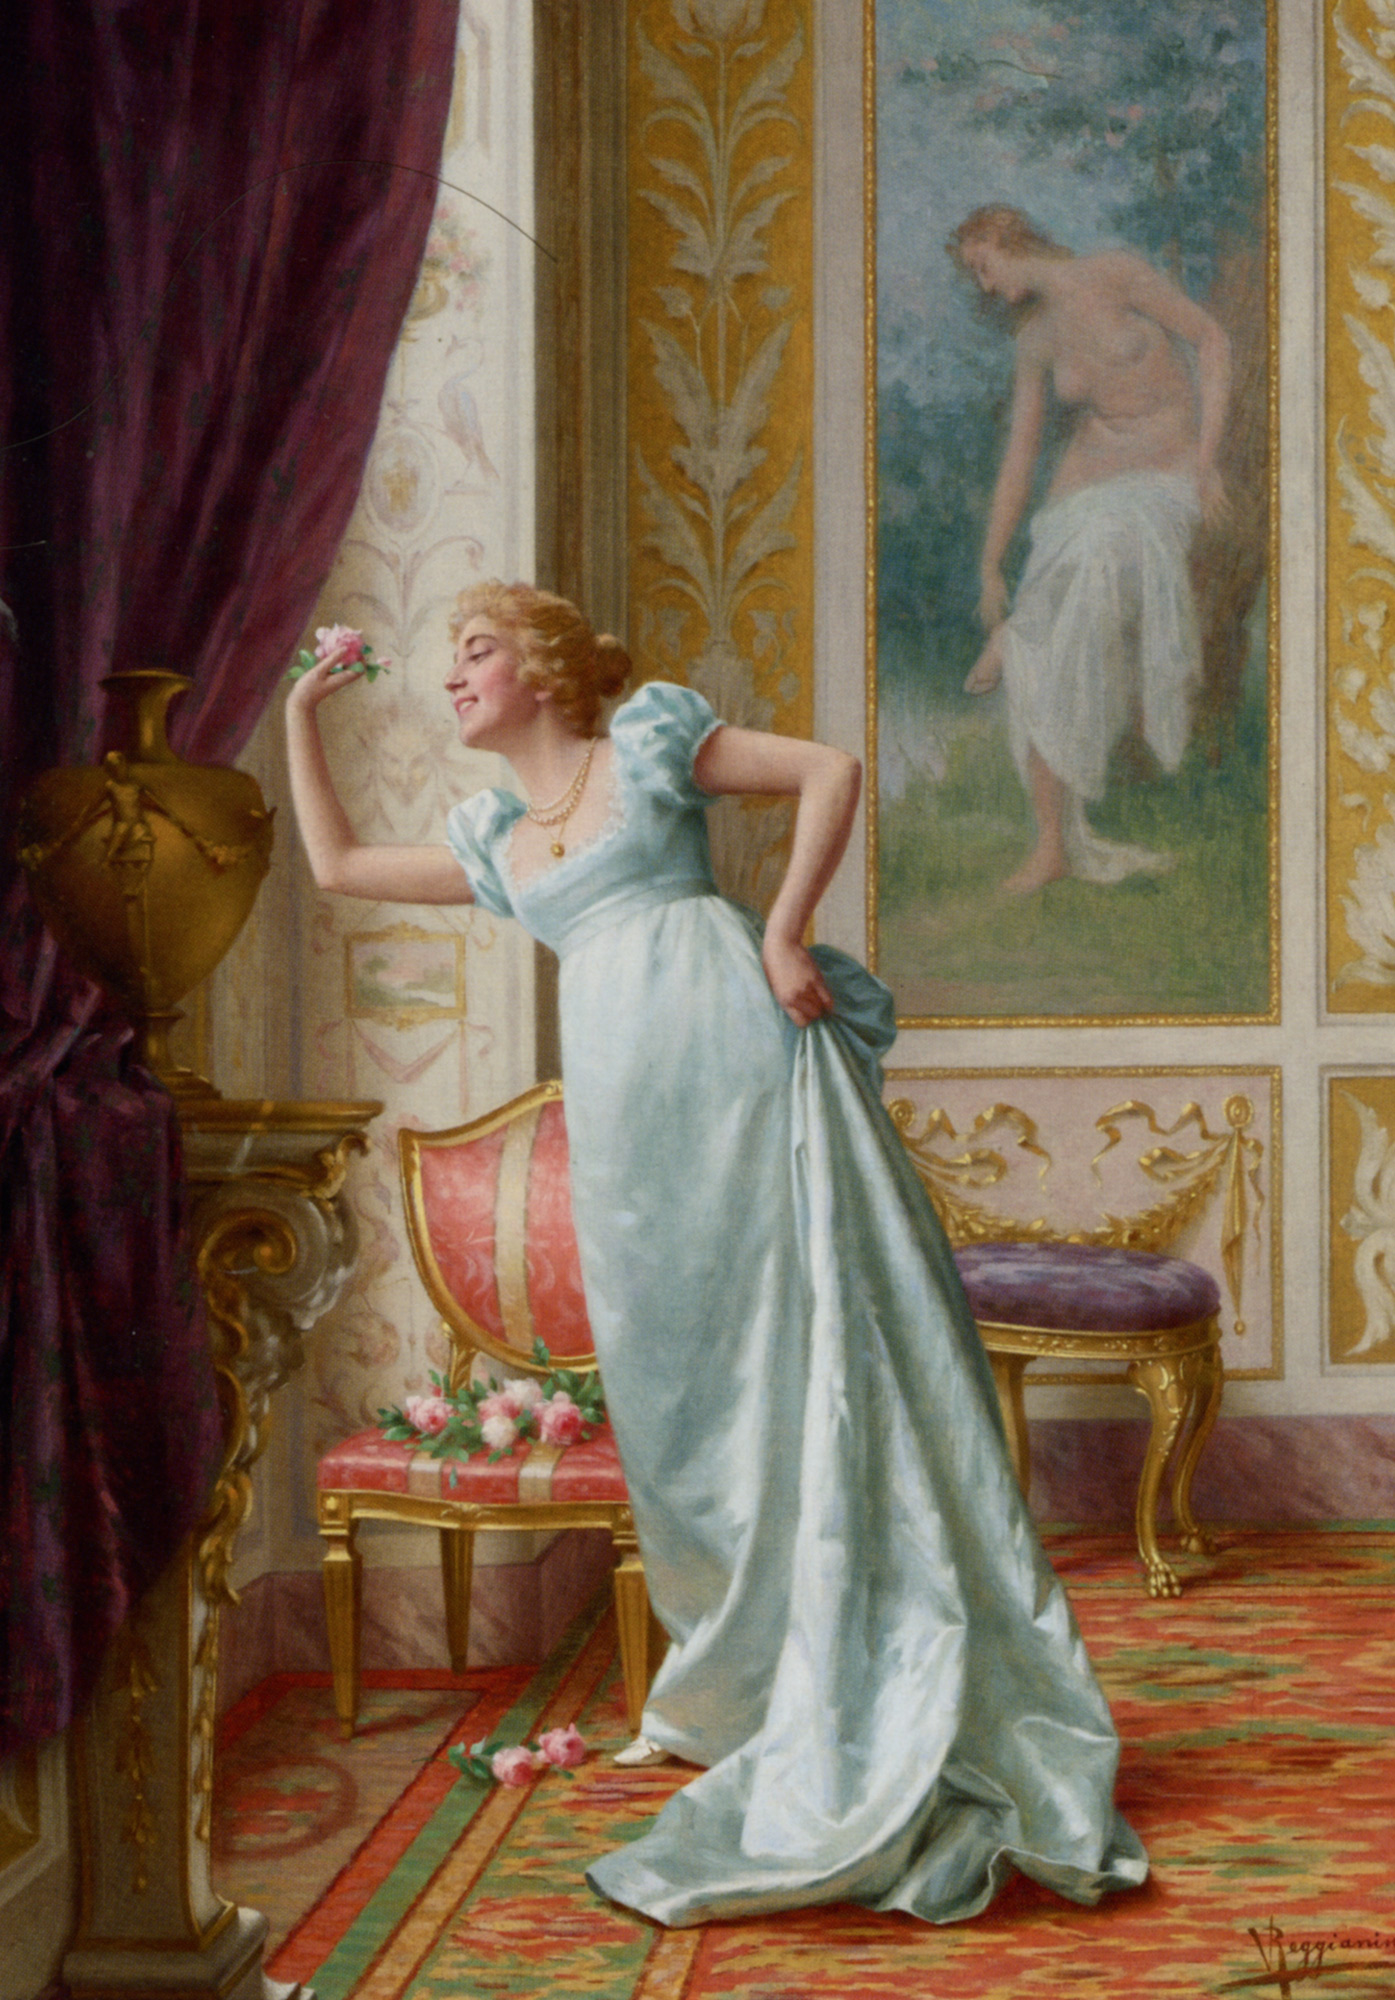 The Attraction :: Vittorio Reggianini - Romantic scenes in art and painting ôîòî